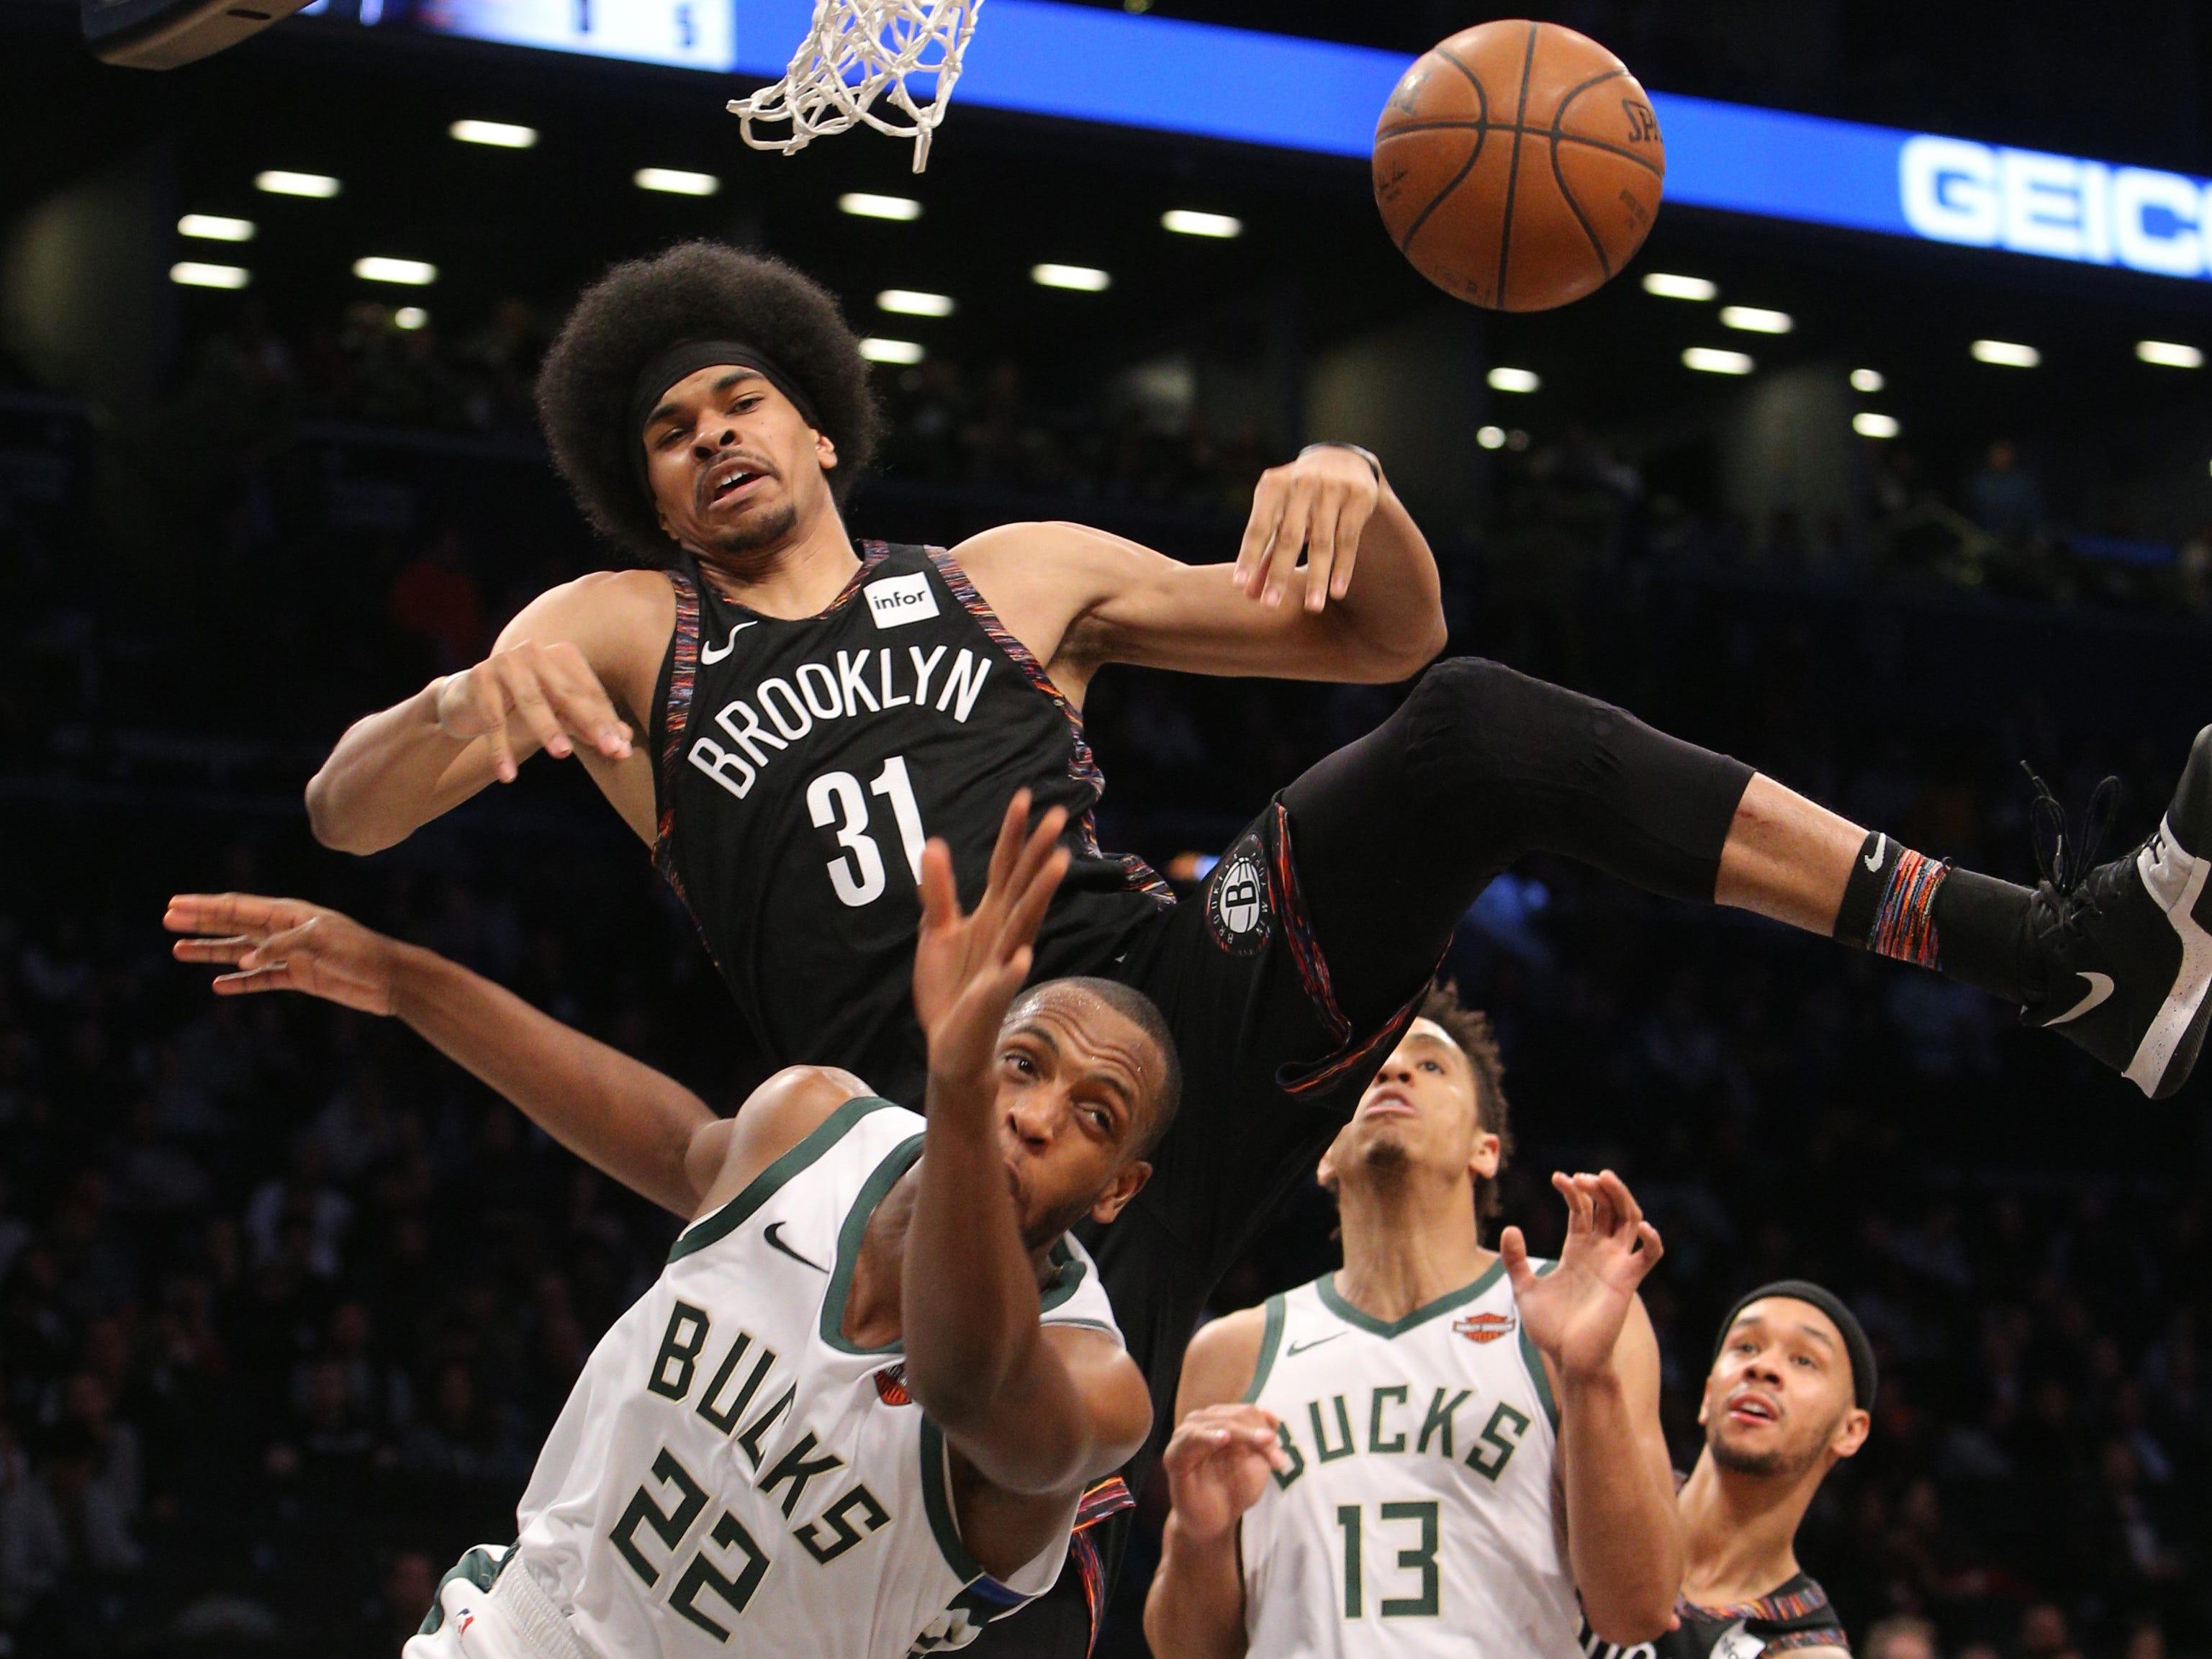 Nets center Jarrett Allen blocks a shot taken by Bucks forward Khris Middleton during the third quarter Monday.